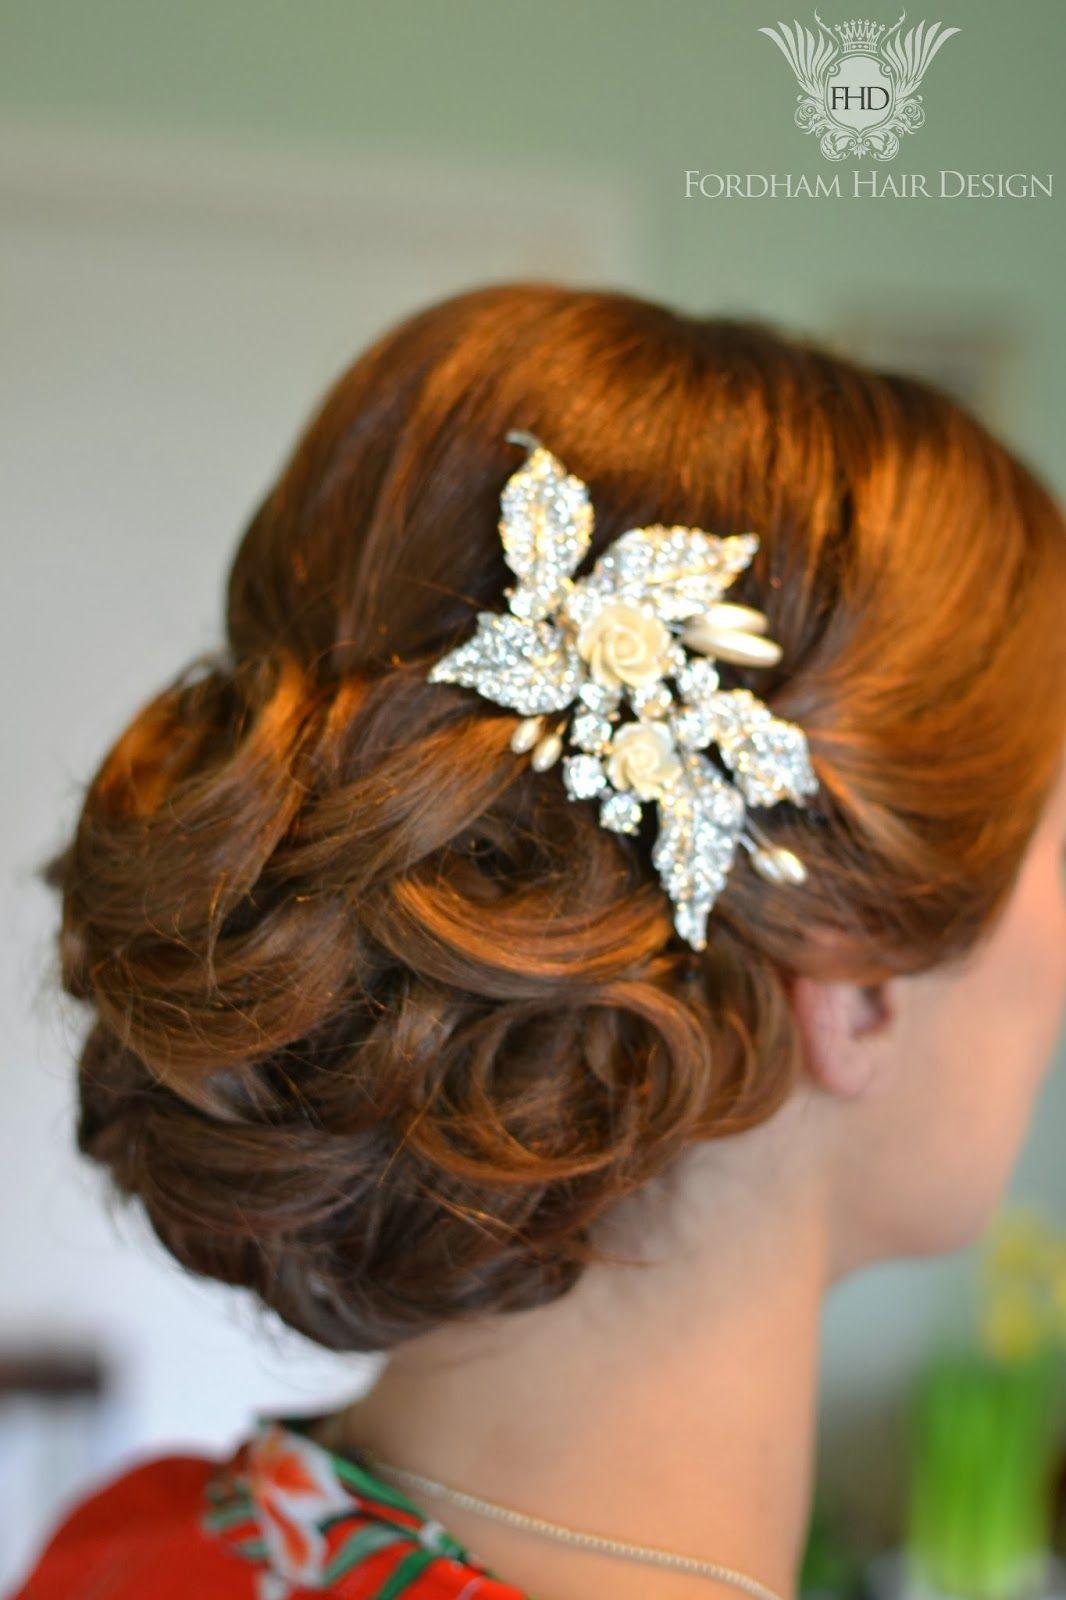 Wedding hair accessories gloucestershire - Wedding Hair Styling By Fordham Hair Design Gloucestershire Vintage Wedding Hair With Fingerwaves